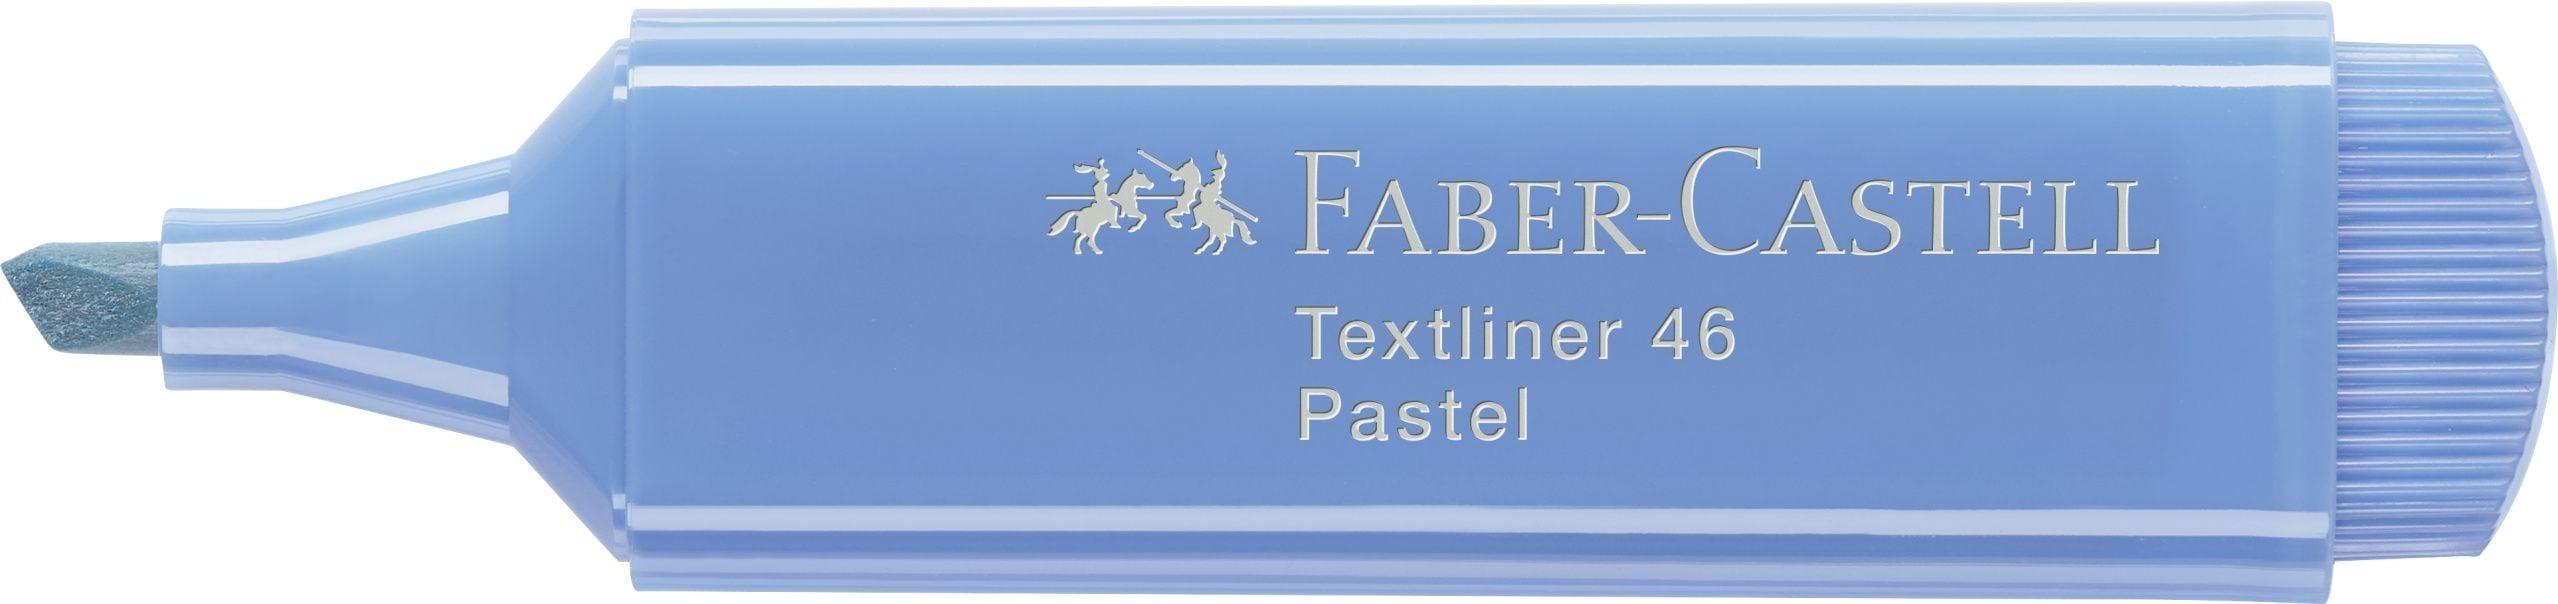 TEXTMARKER ALBASTRU MARIN PASTEL 1546 FABER-CASTELL